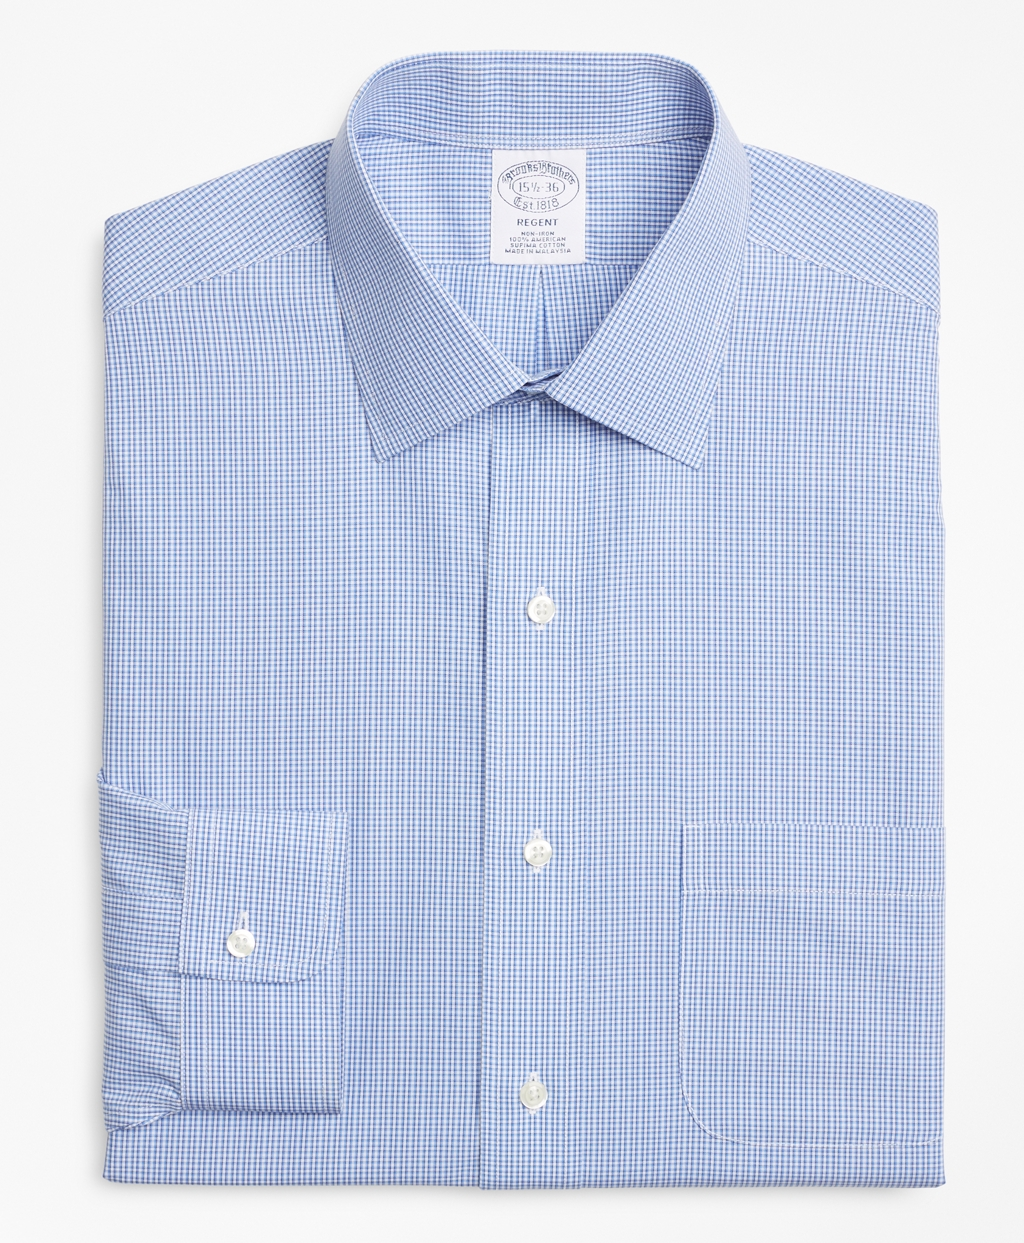 Regent Fitted Dress Shirt Non Iron Micro Framed Gingham Brooks